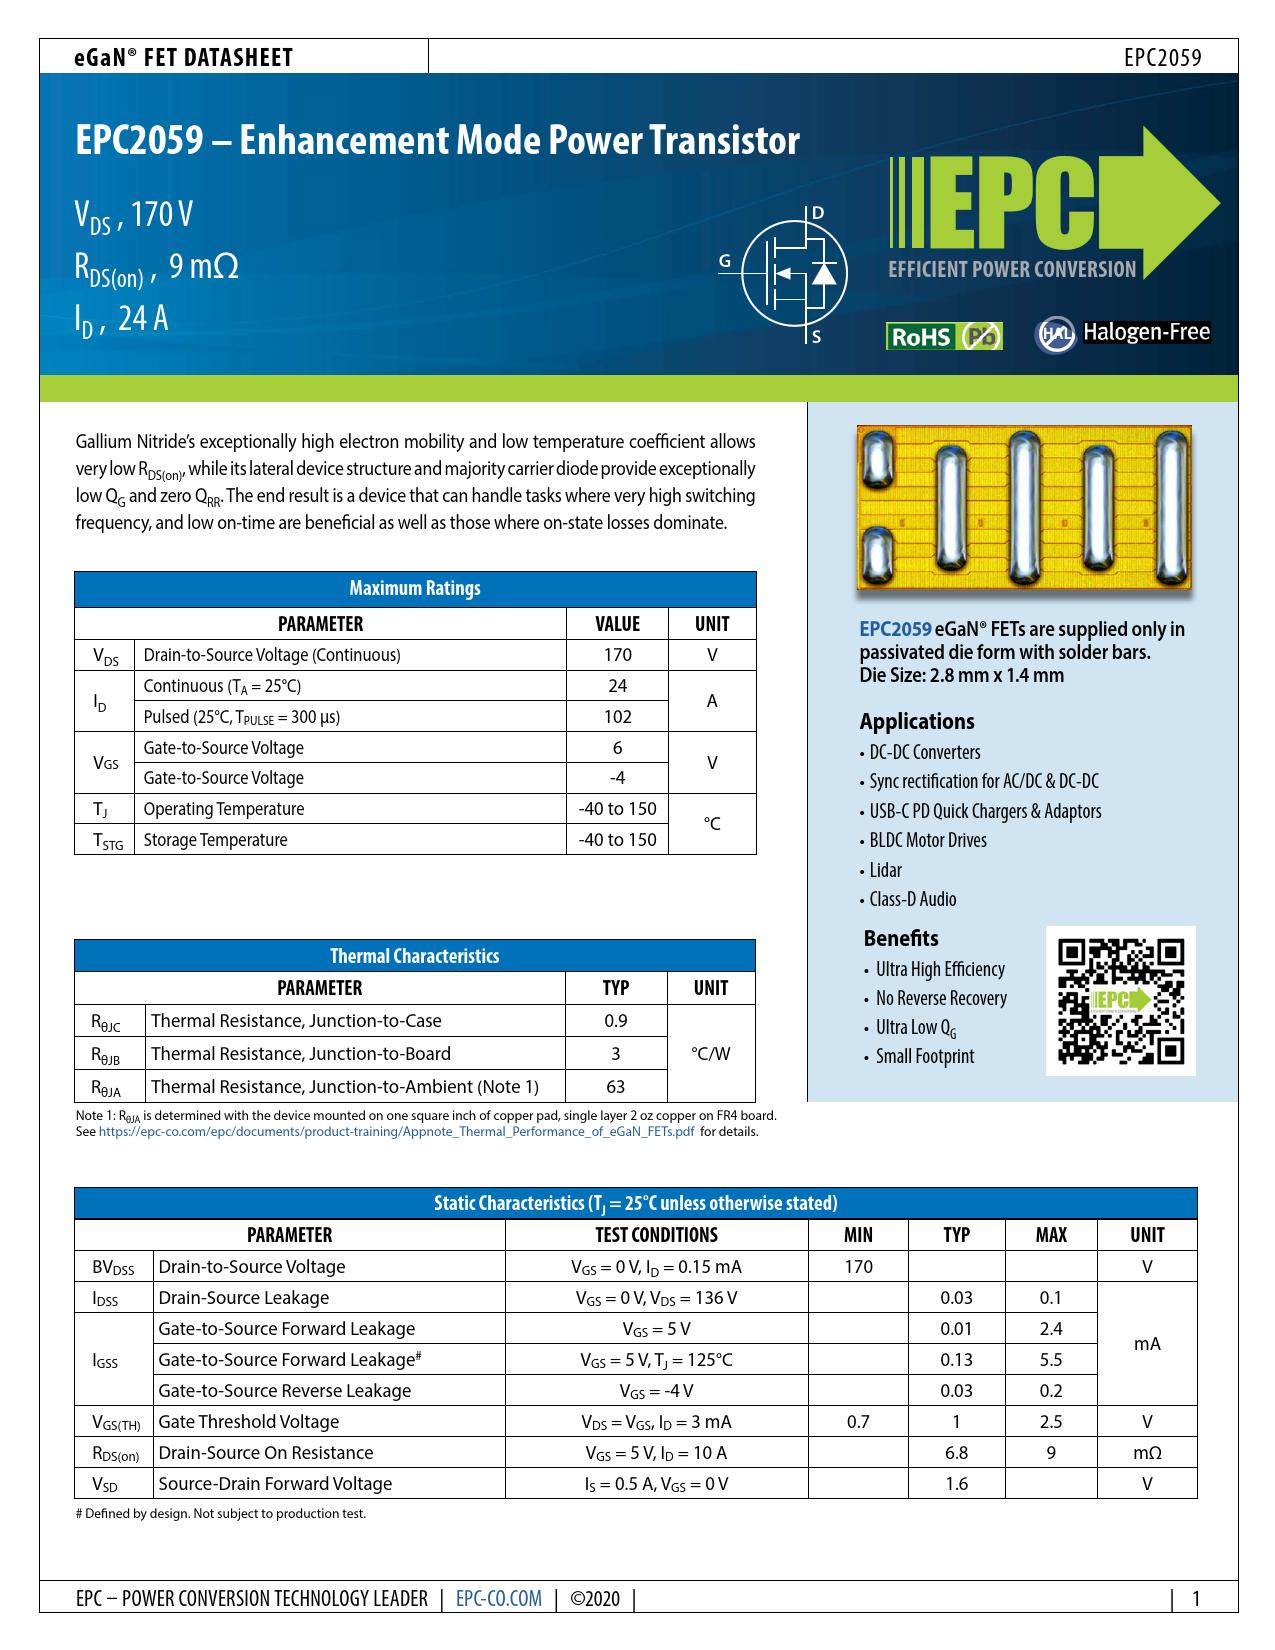 Datasheet EPC2059 Efficient Power Conversion